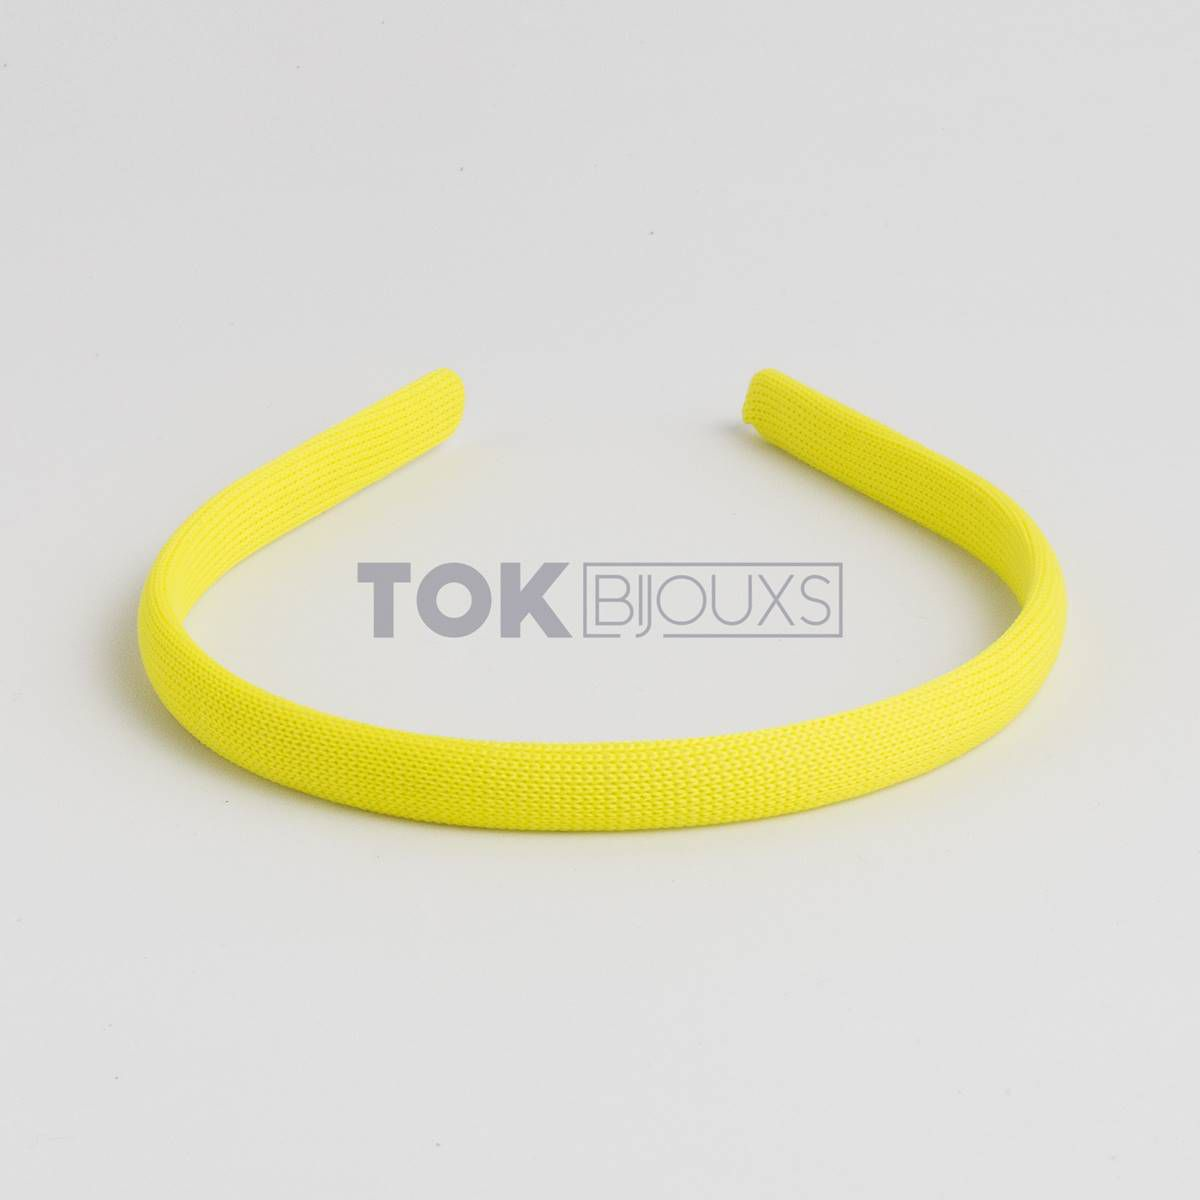 Tiaras Encapadas 10mm - Amarelo - 12Unid